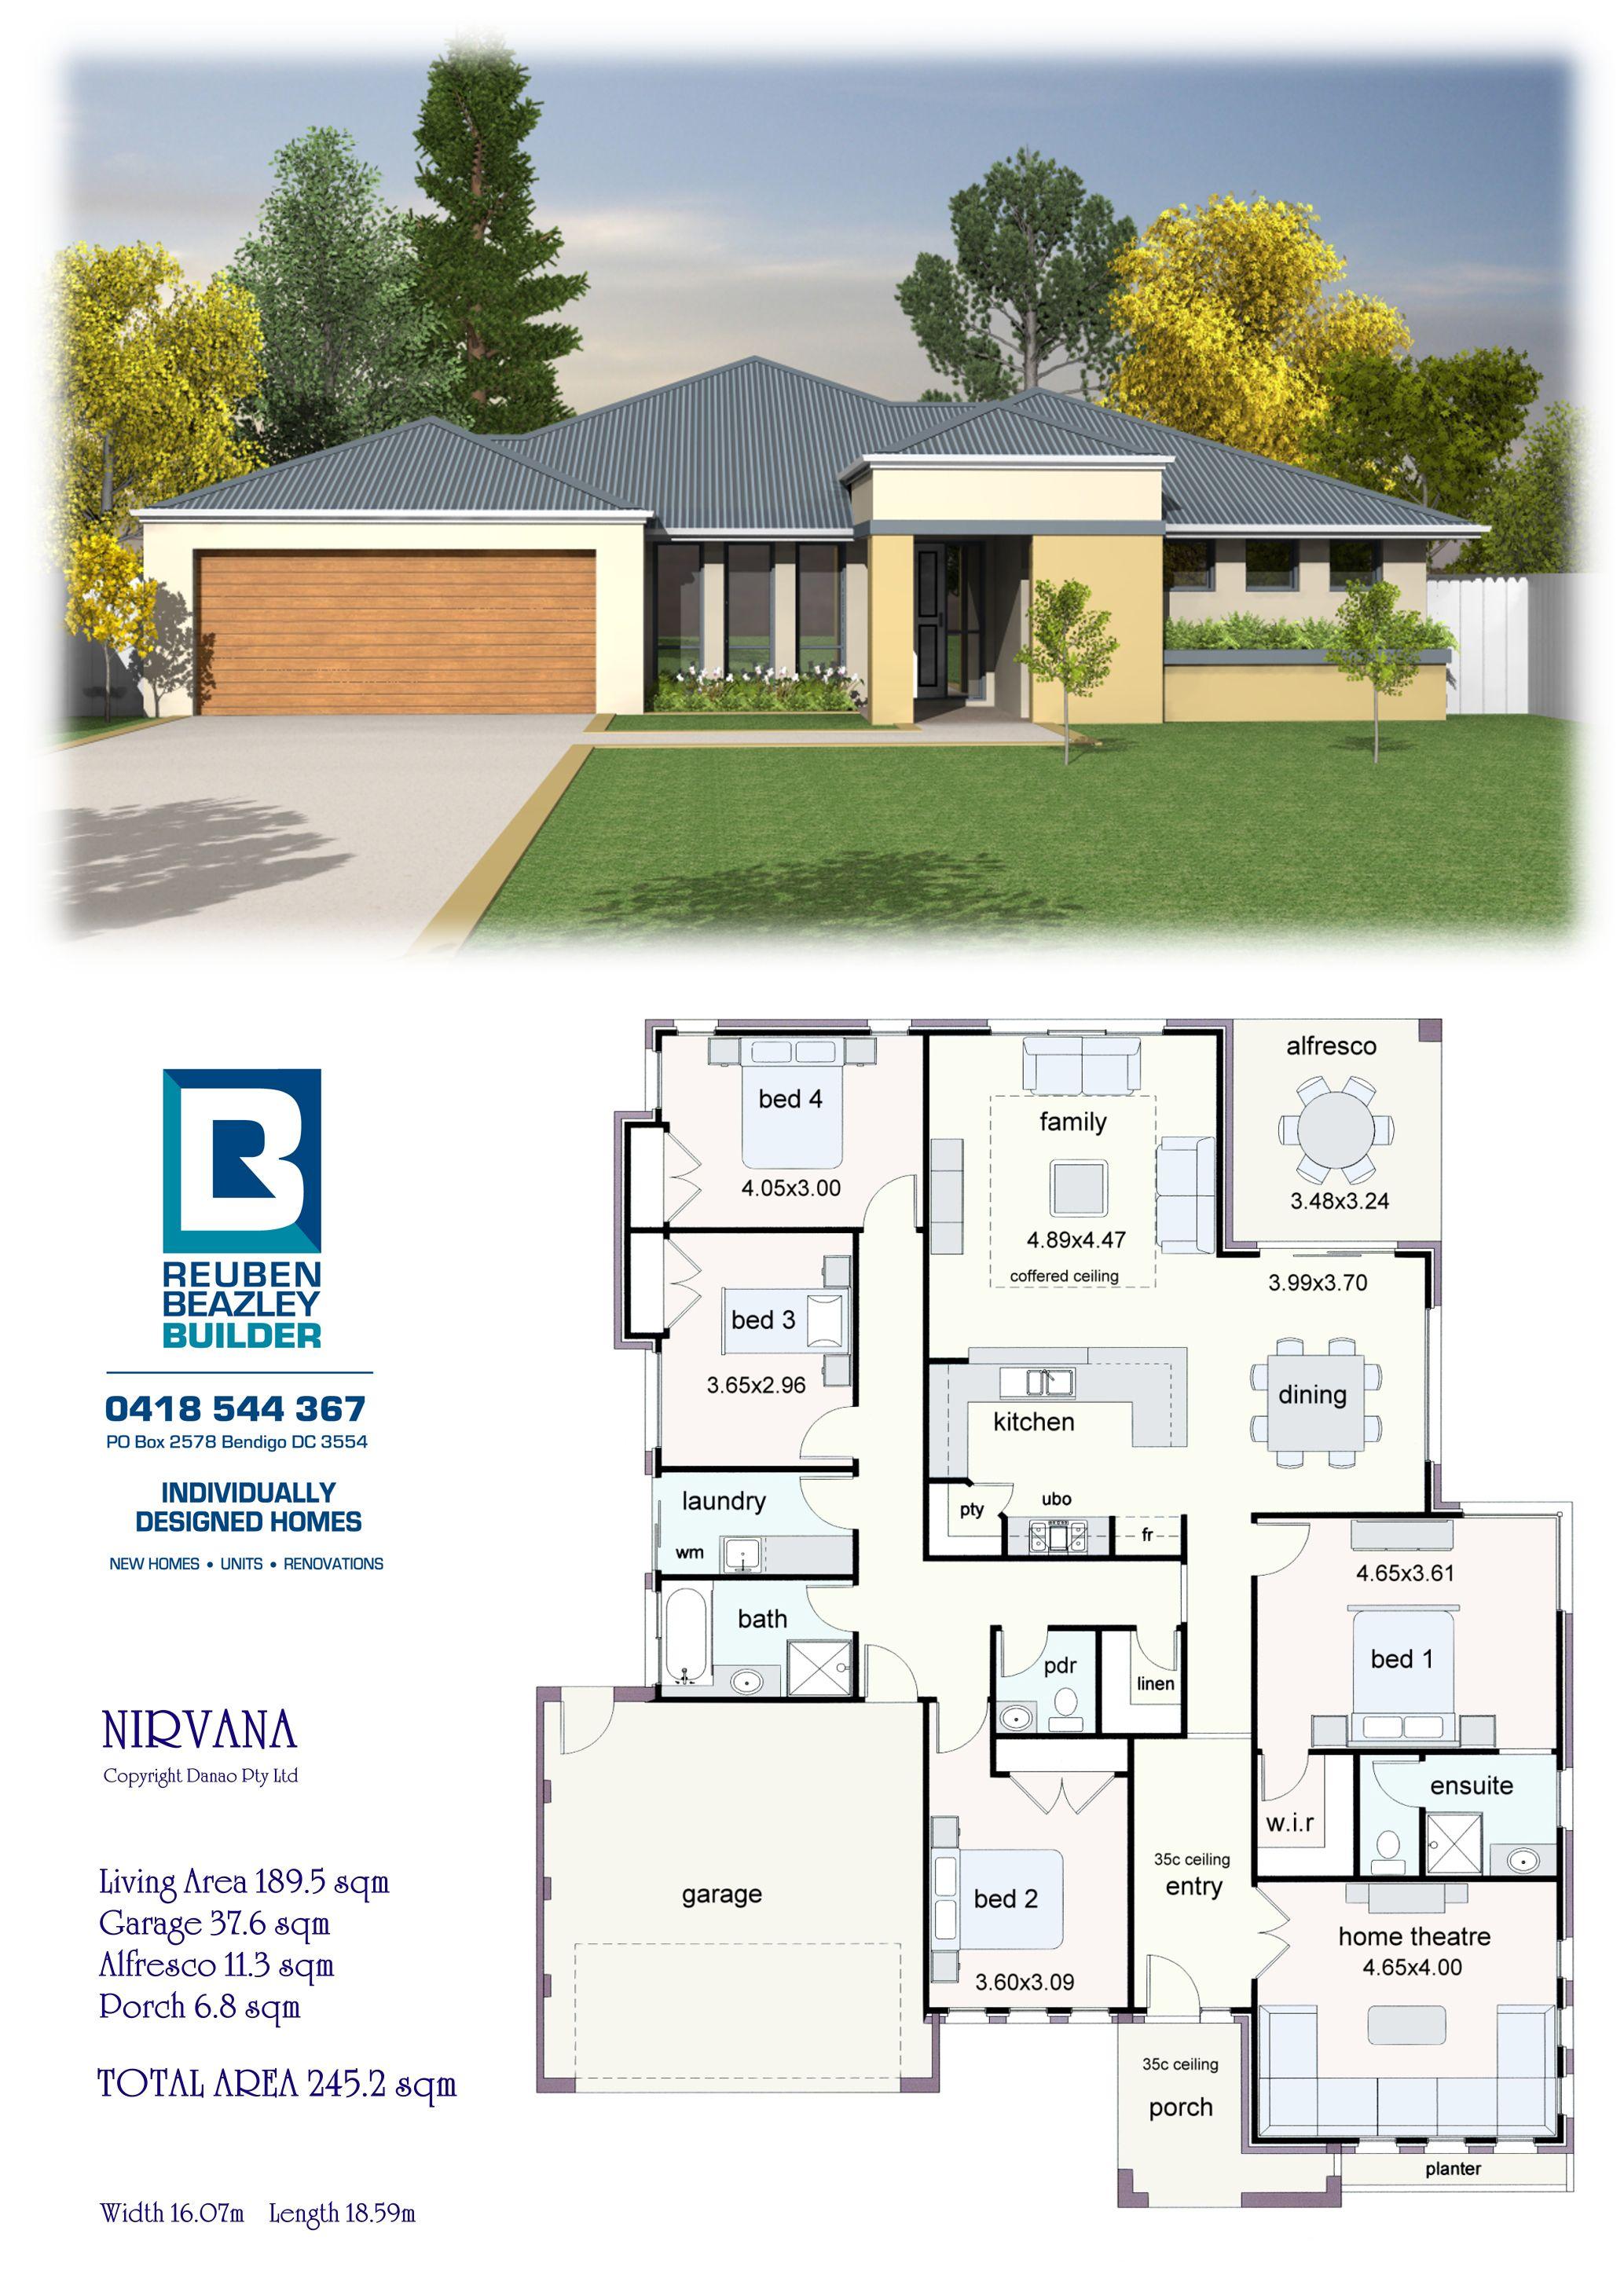 The Nirvana Model House Plan My House Plans Dream House Plans